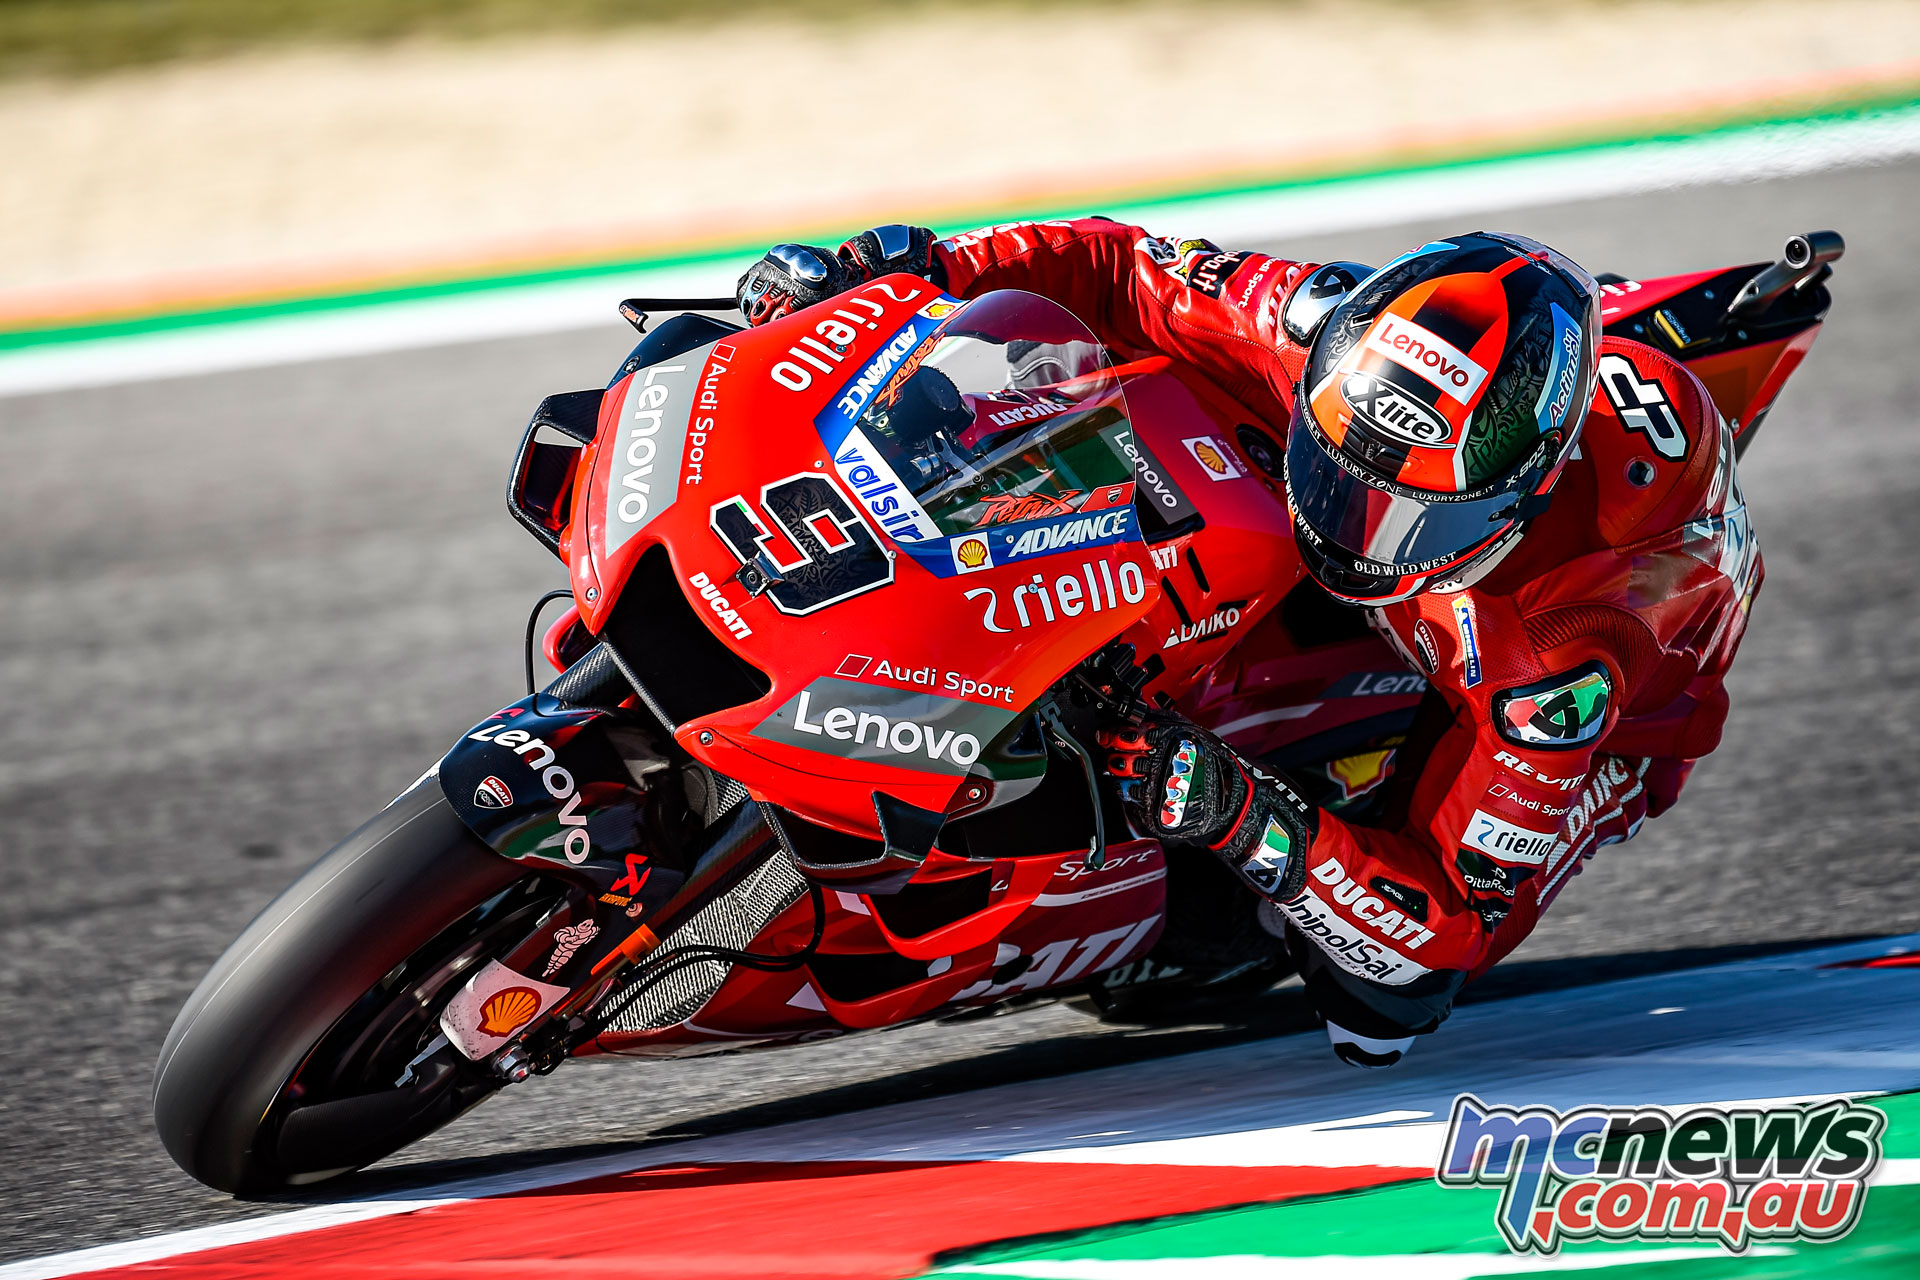 MotoGP Rnd Misano Fri Danilo Petrucci